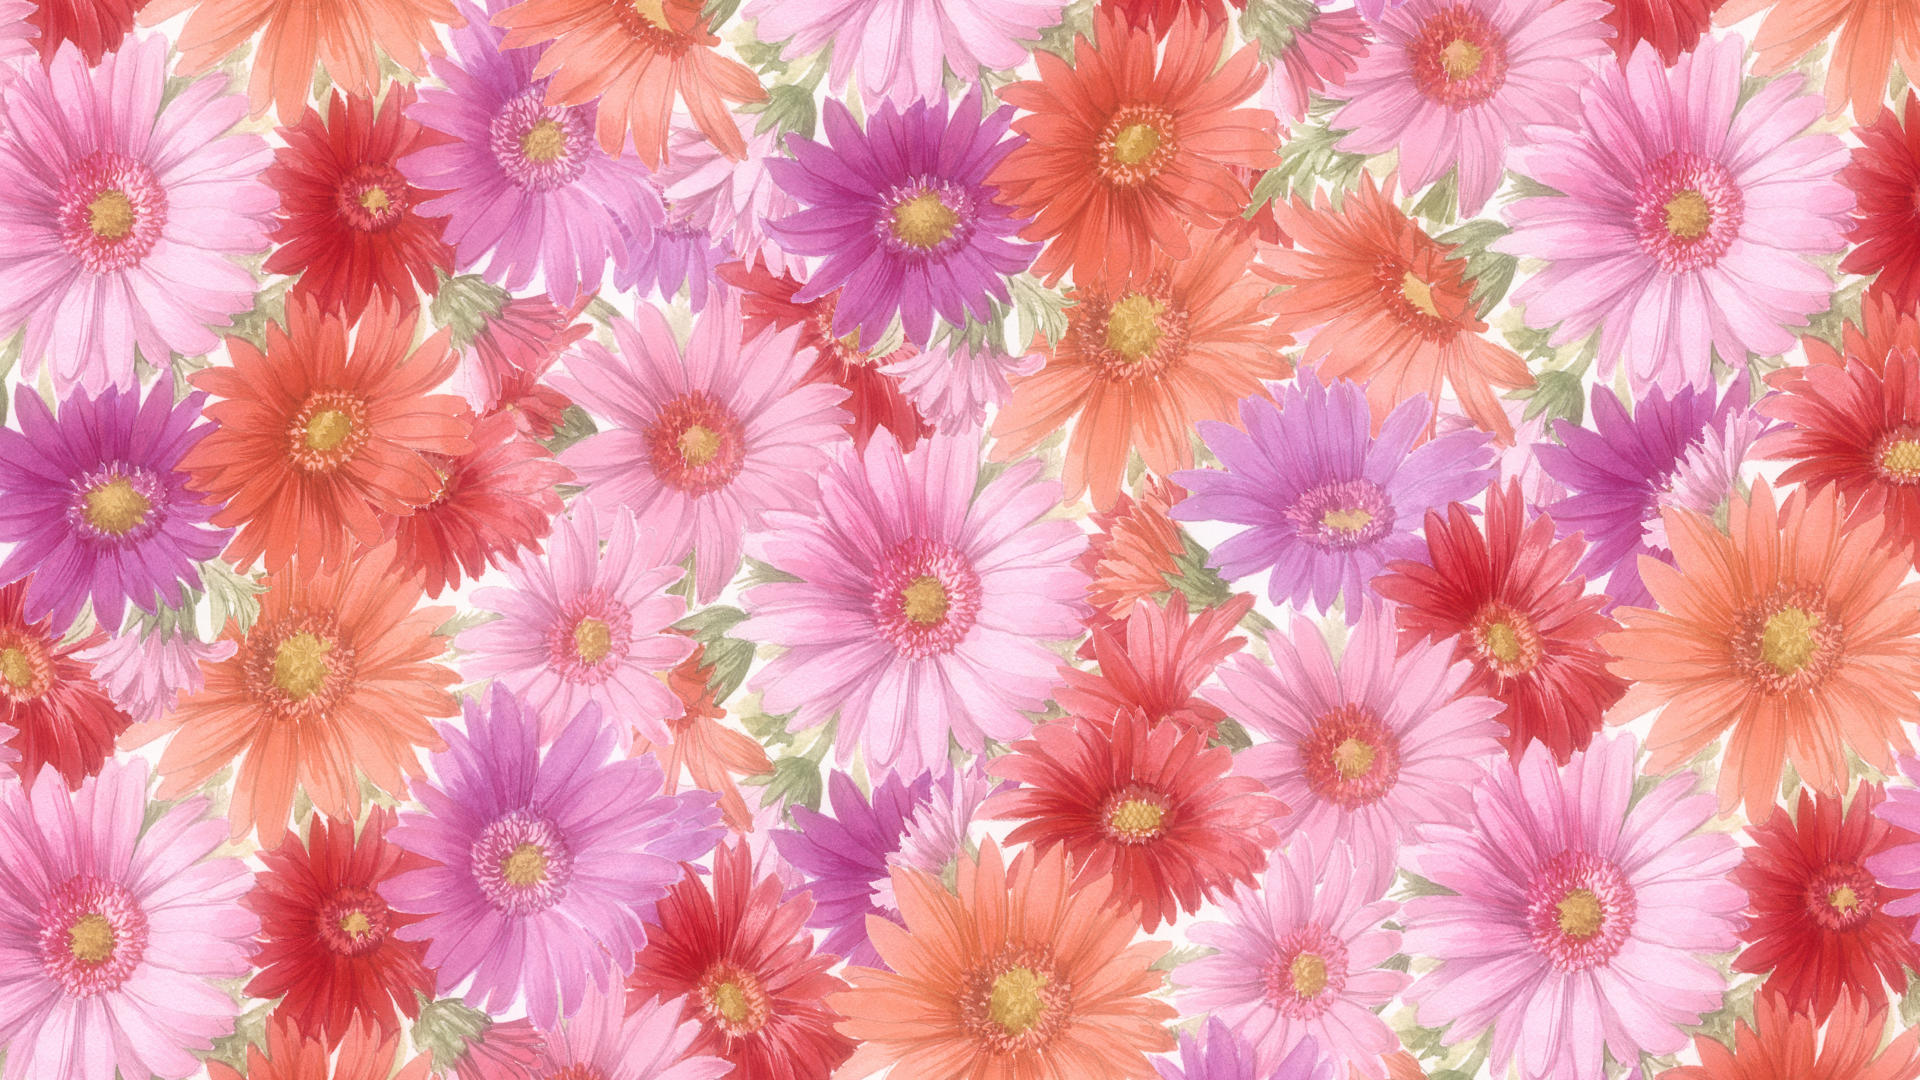 Flowers Wallpaper 155 Wallpapers Desktop Wallpapers HD 1920x1080